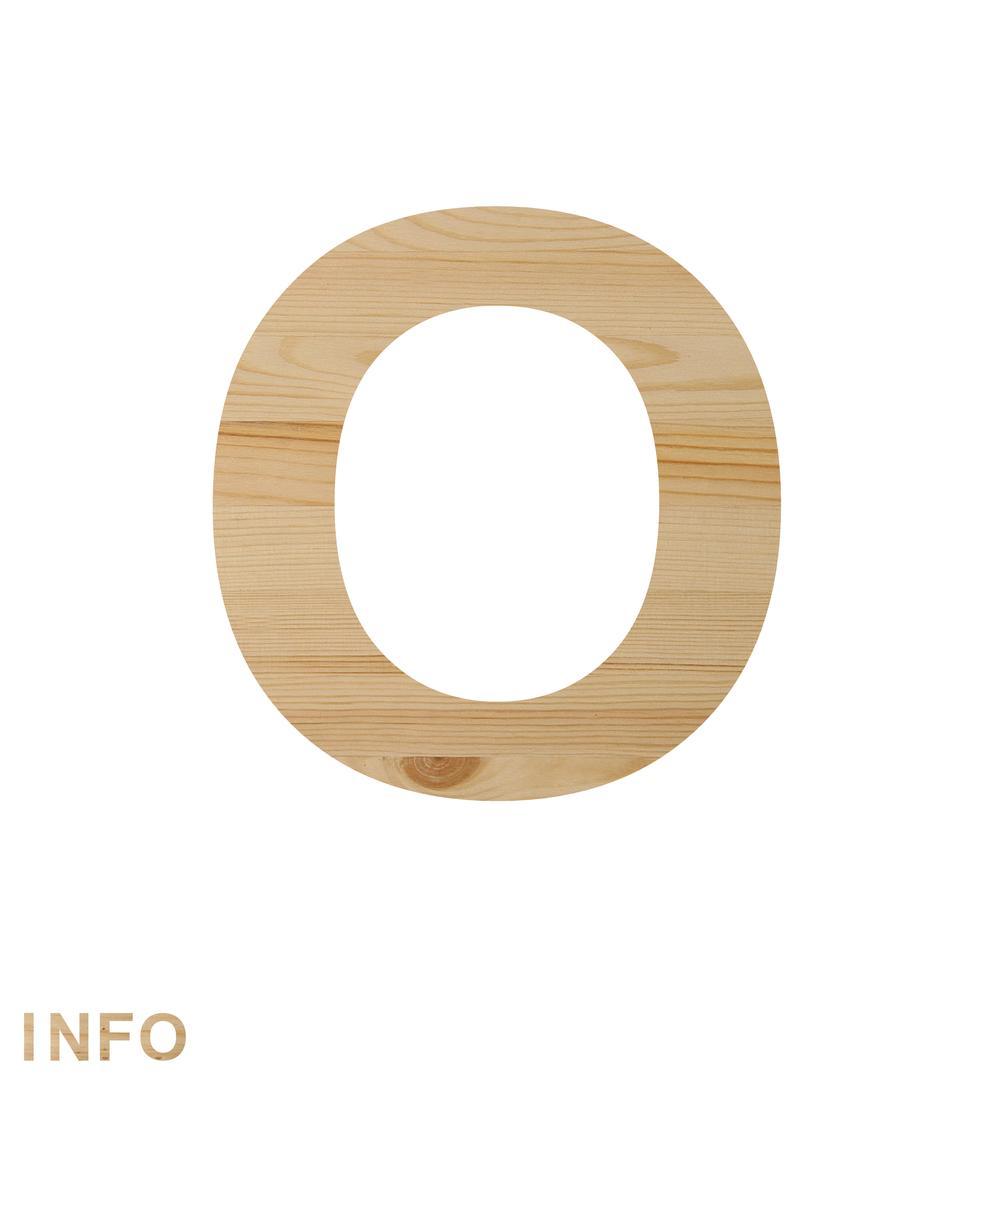 O+O.jpg